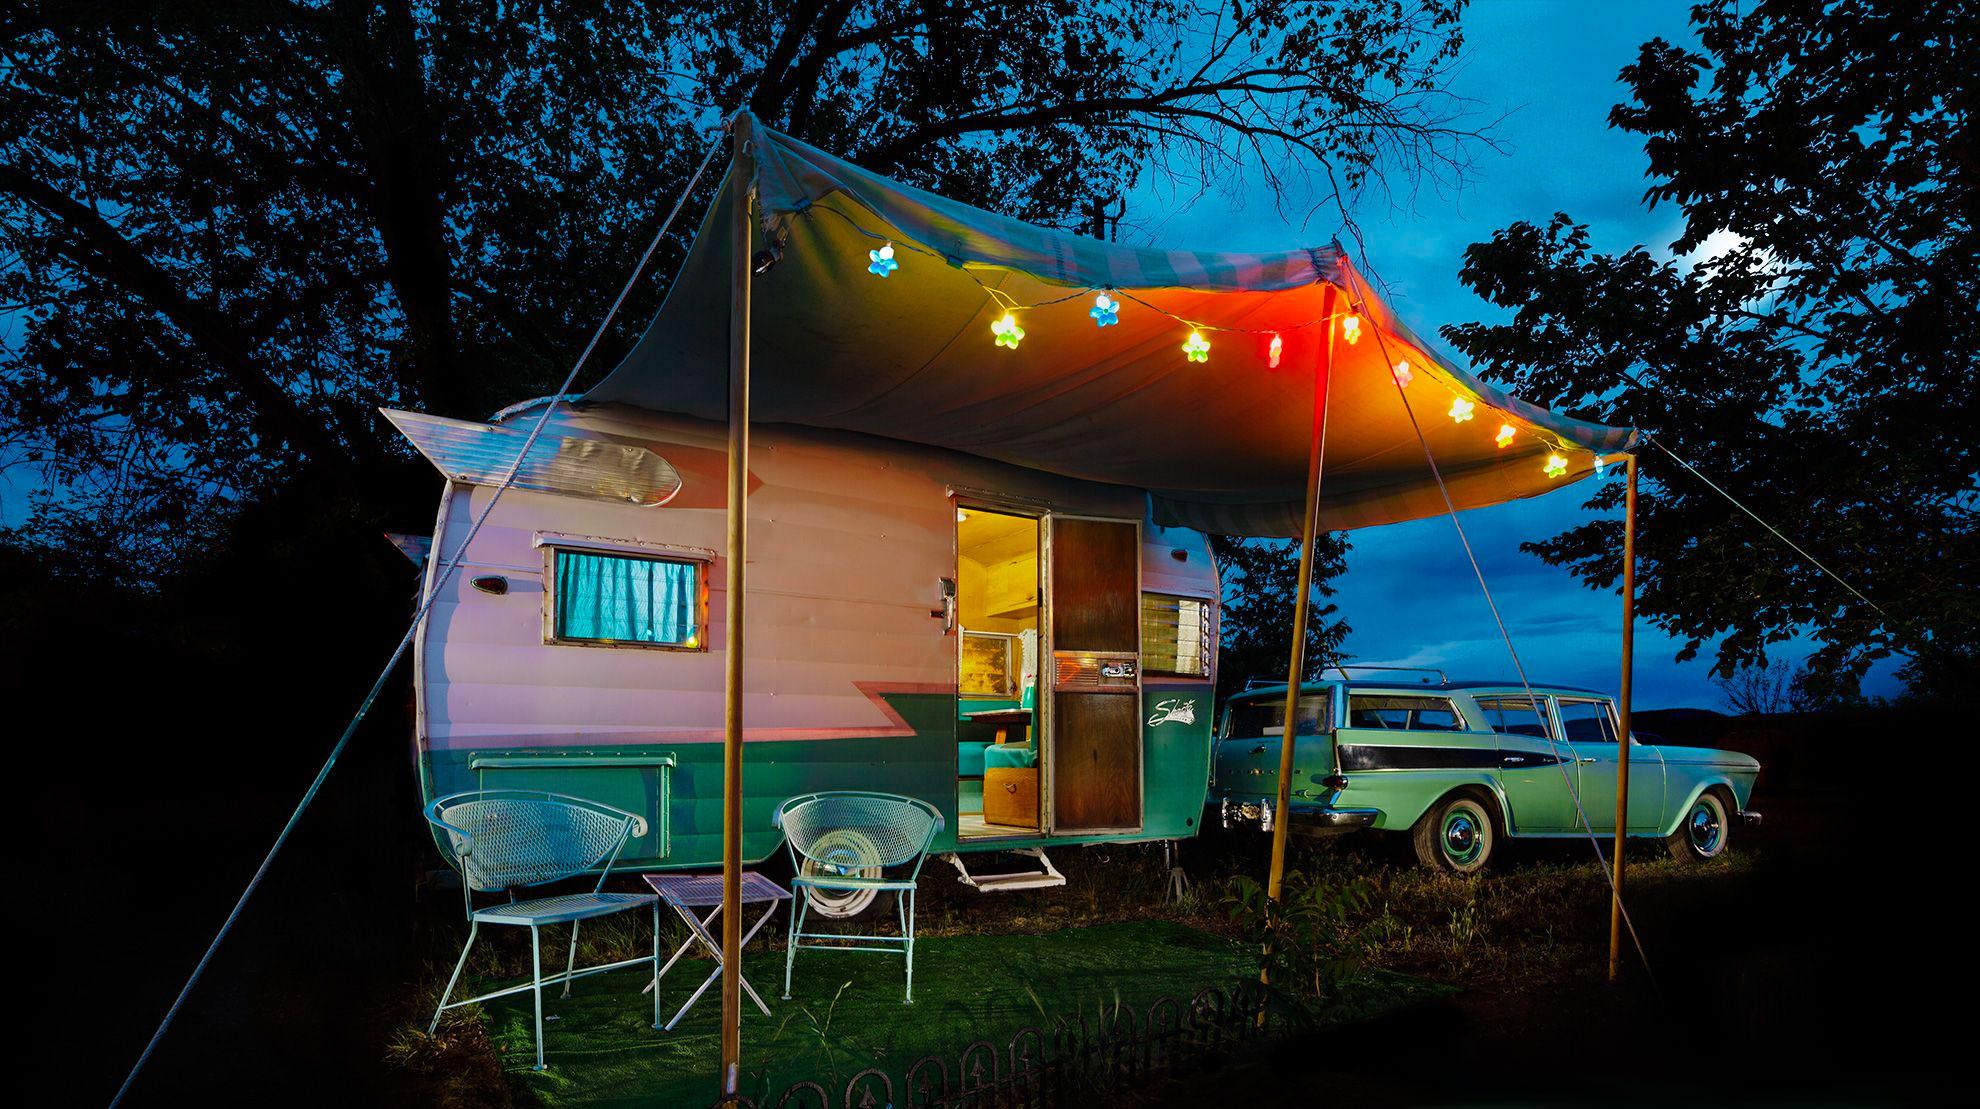 The Starlite Classic Campground